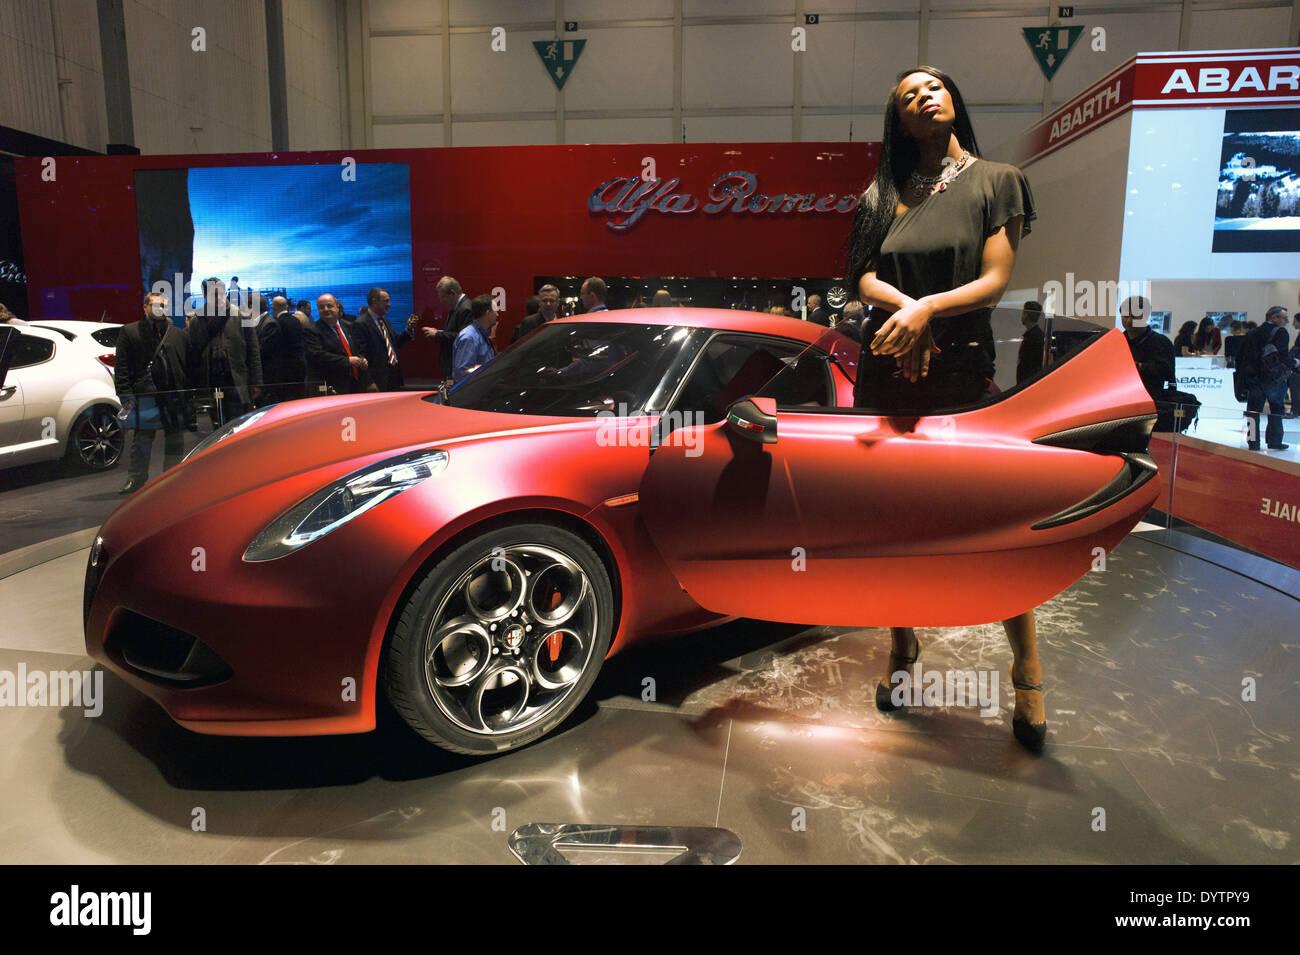 Alfa Romeo C4 Stockbild